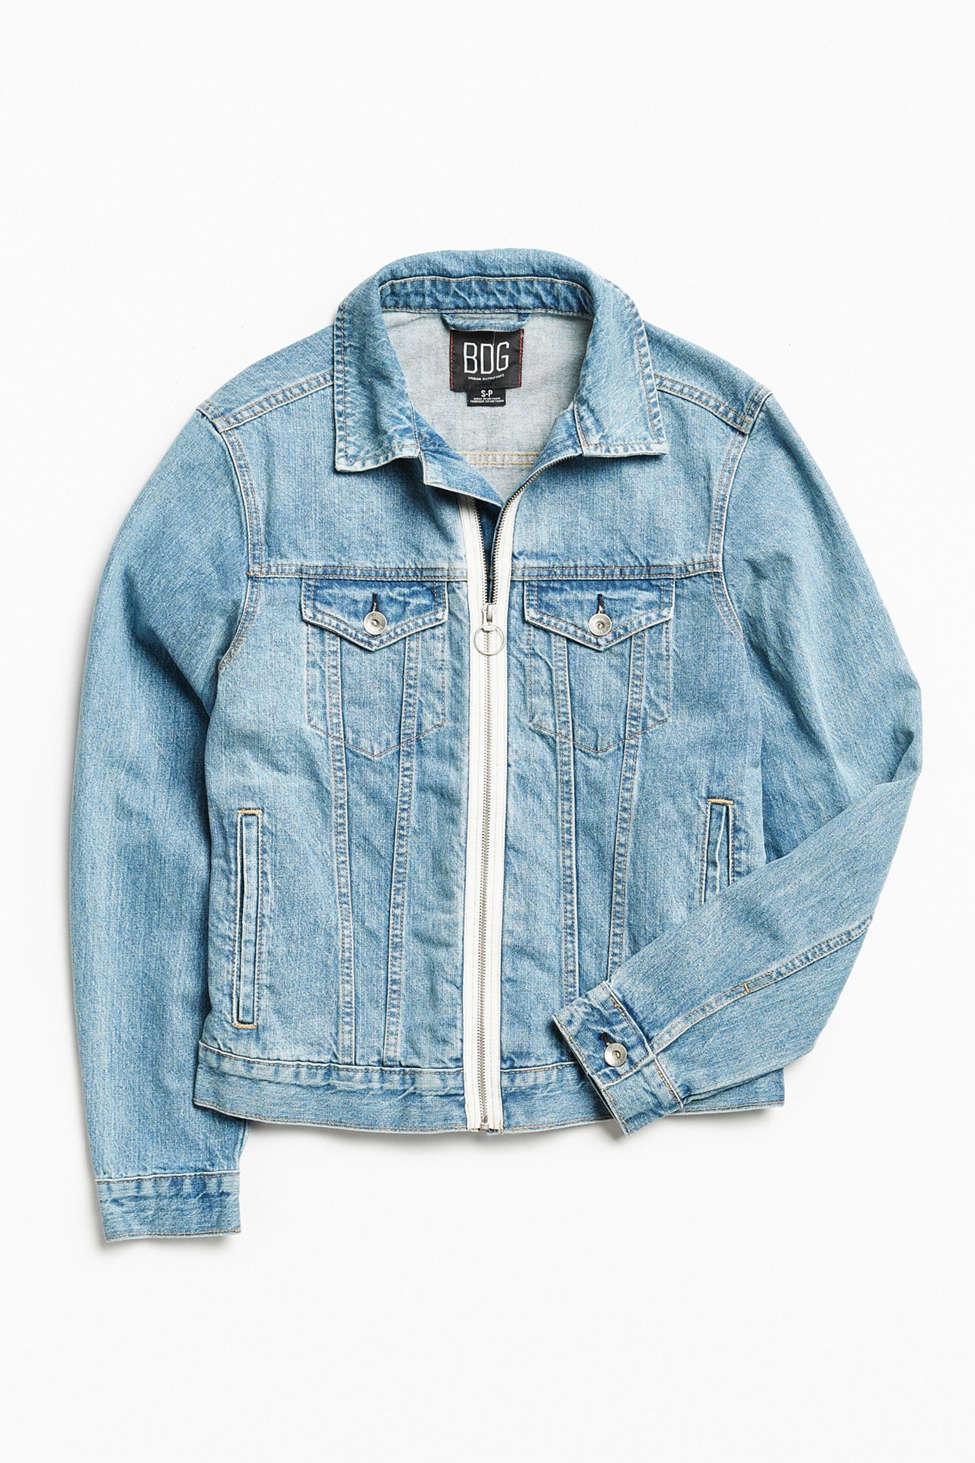 Bdg Zip Front Denim Trucker Jacket Urban Outfitters